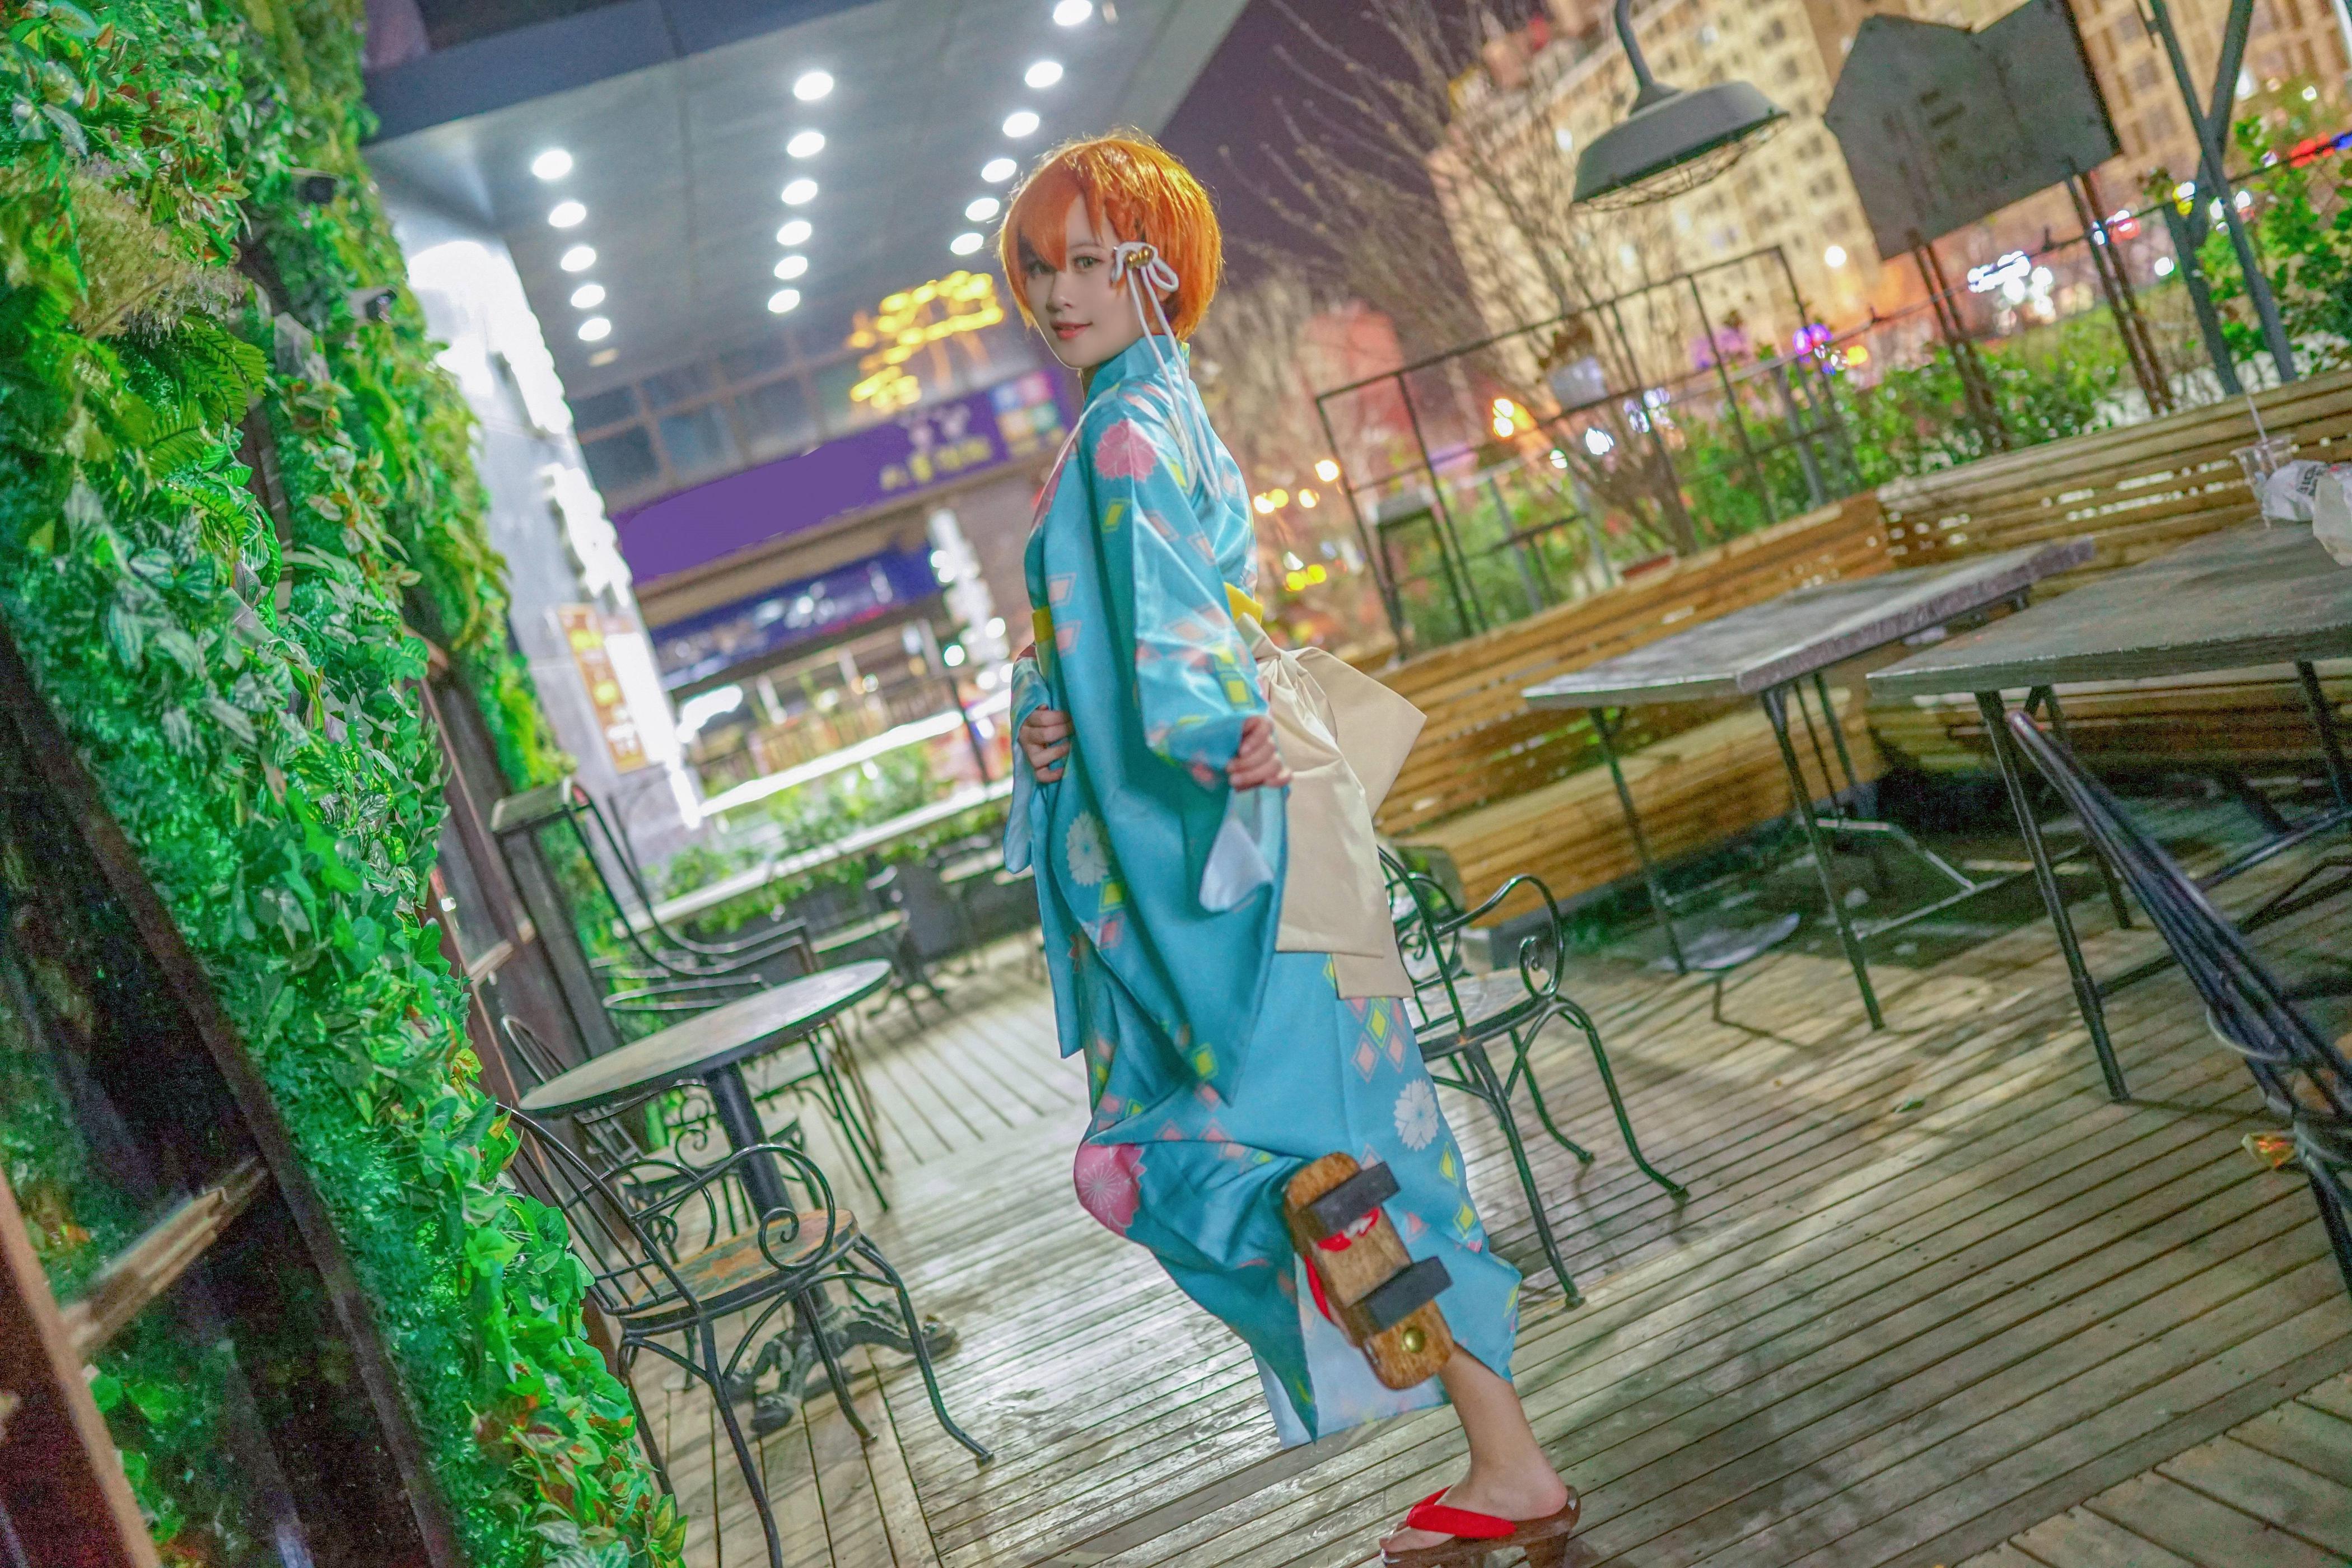 《LOVE LIVE!》萌妹cosplay【CN:_李笑颜Lee】-第8张